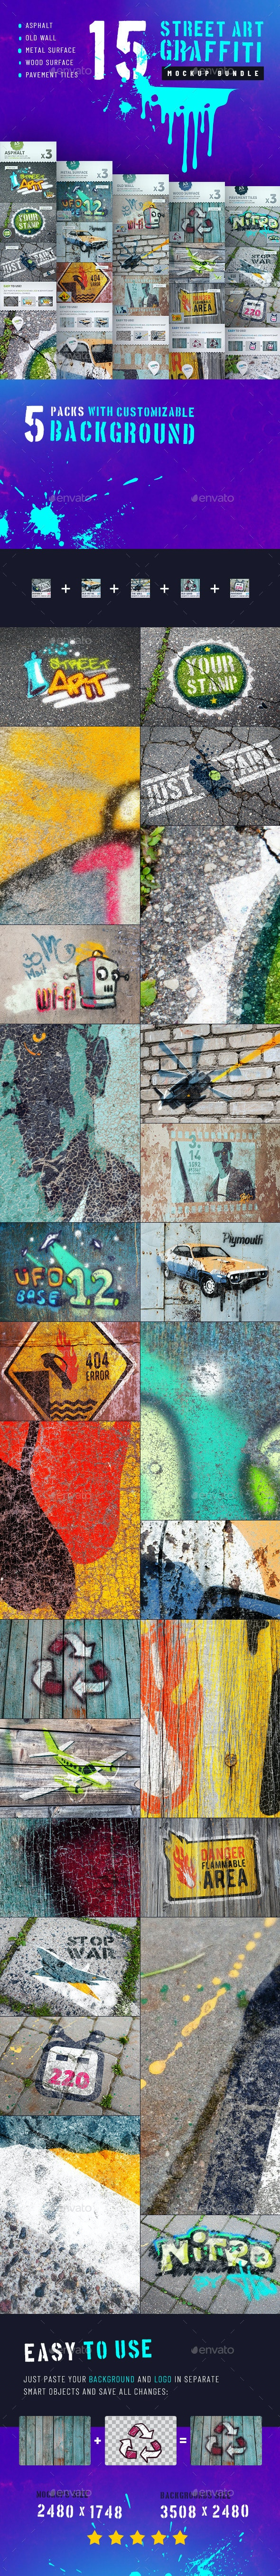 Street Art Graffiti Mockup Bundle - Miscellaneous Product Mock-Ups